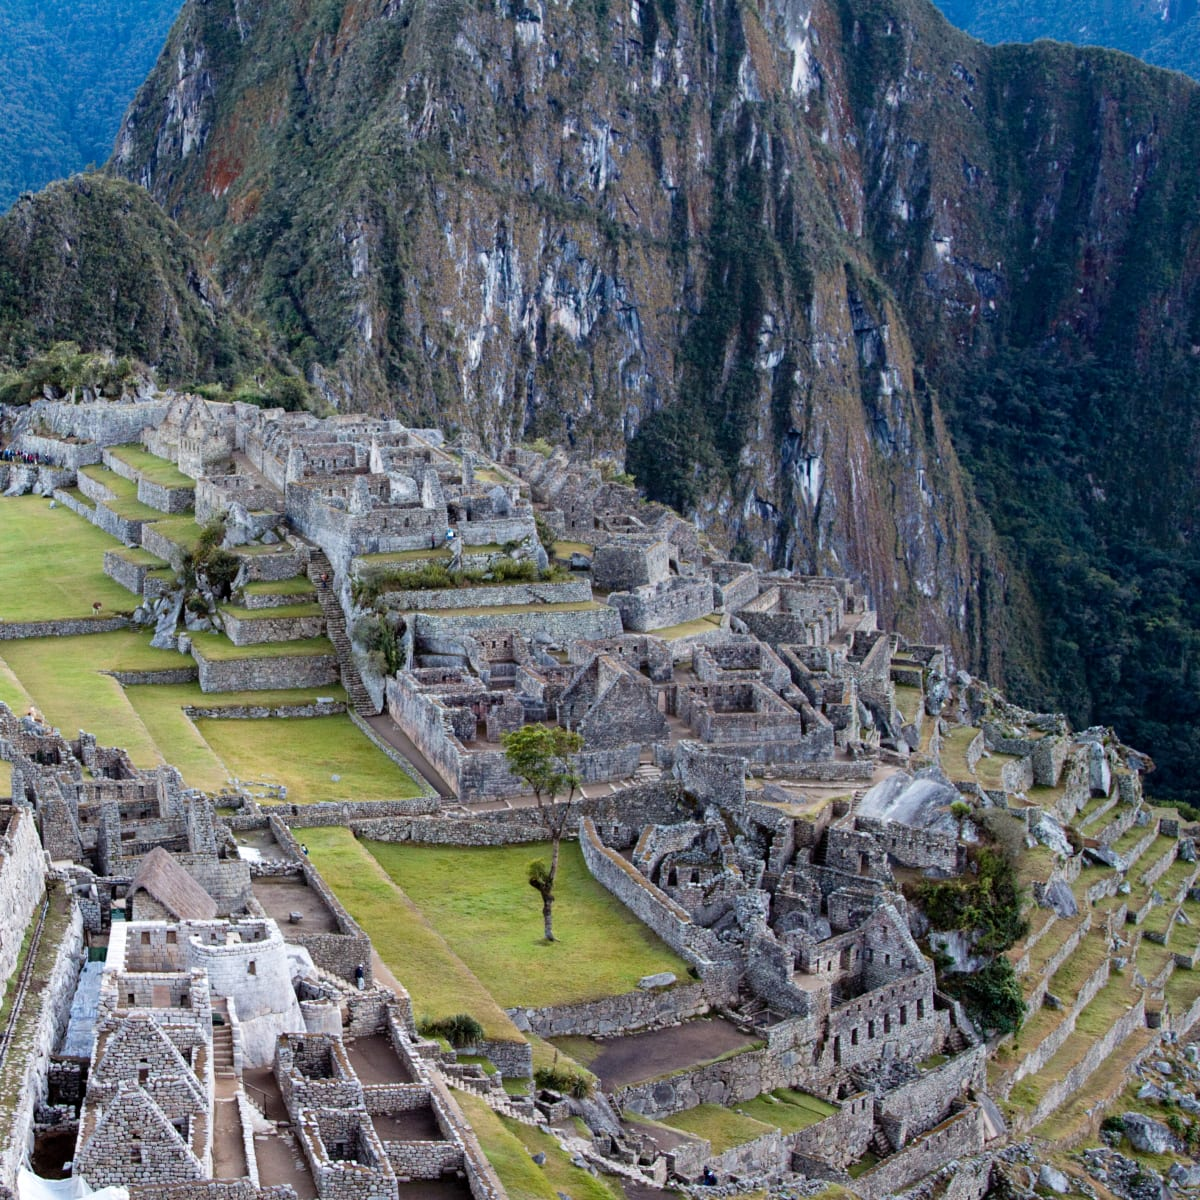 Machu Picchu ruins and Huayna Picchu Mountain